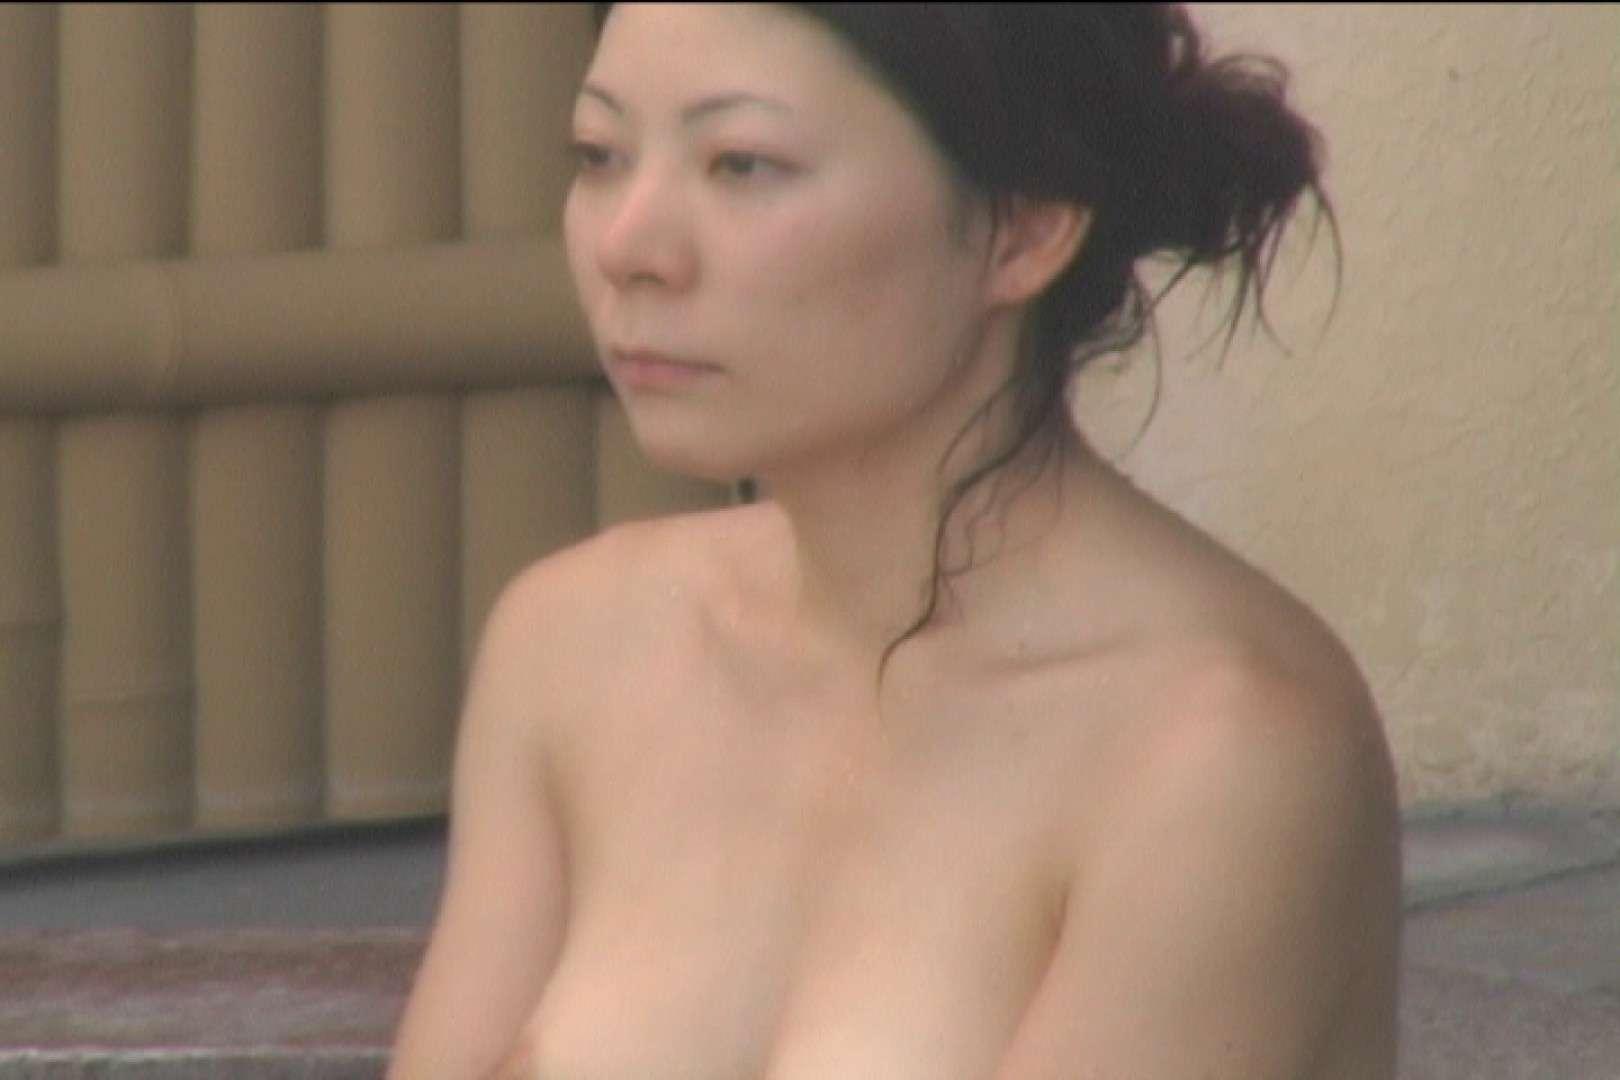 Aquaな露天風呂Vol.533 綺麗なOLたち オマンコ無修正動画無料 108枚 68